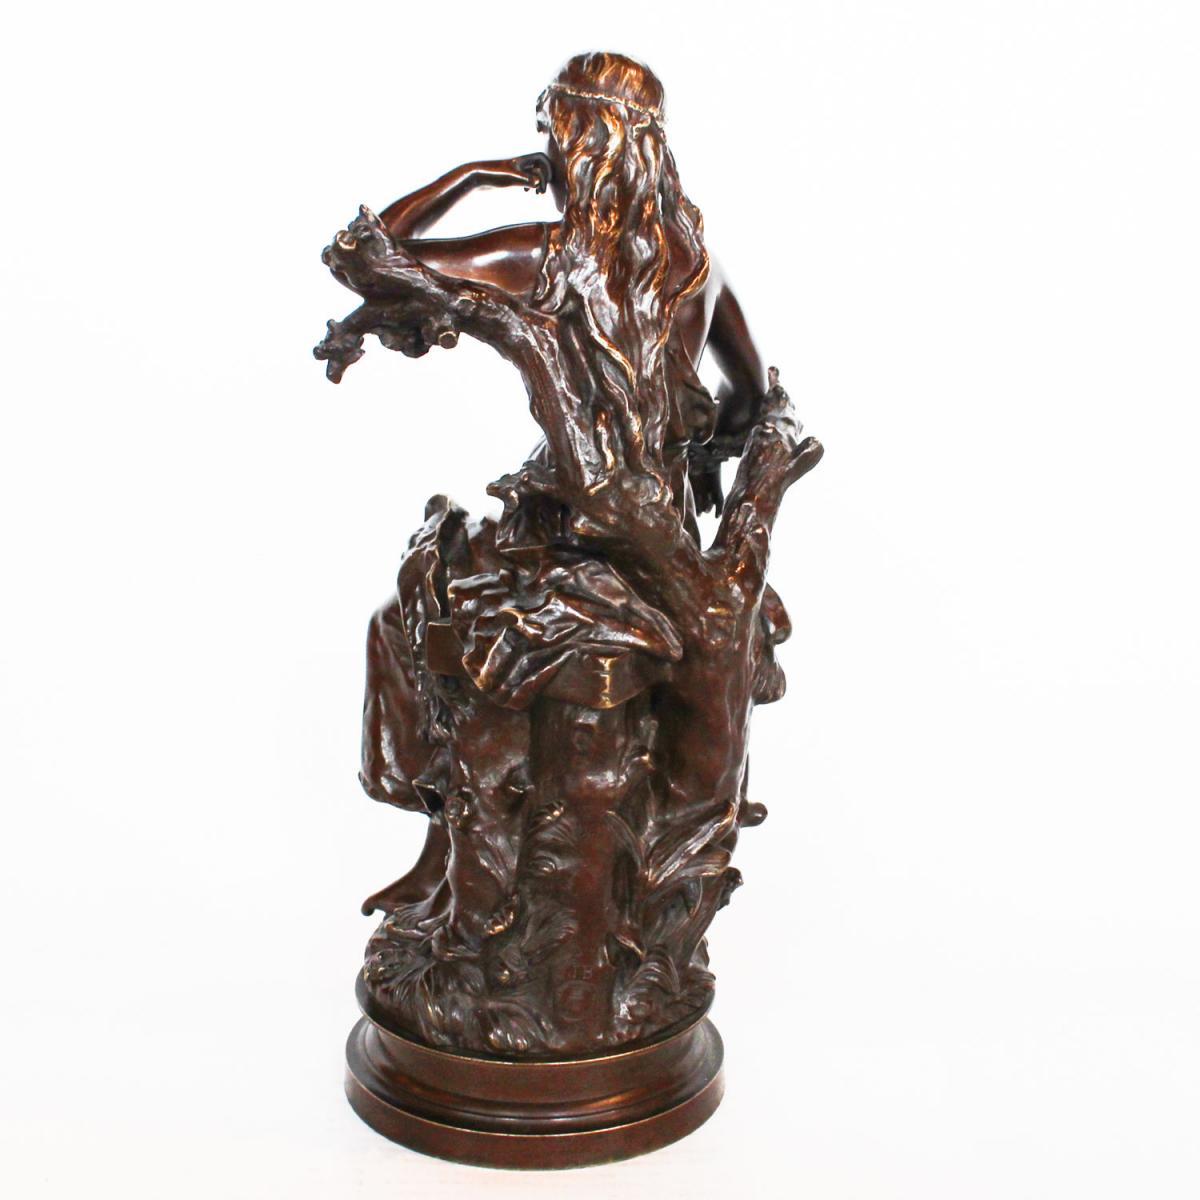 Captive by Hippolyte Francois Moreau